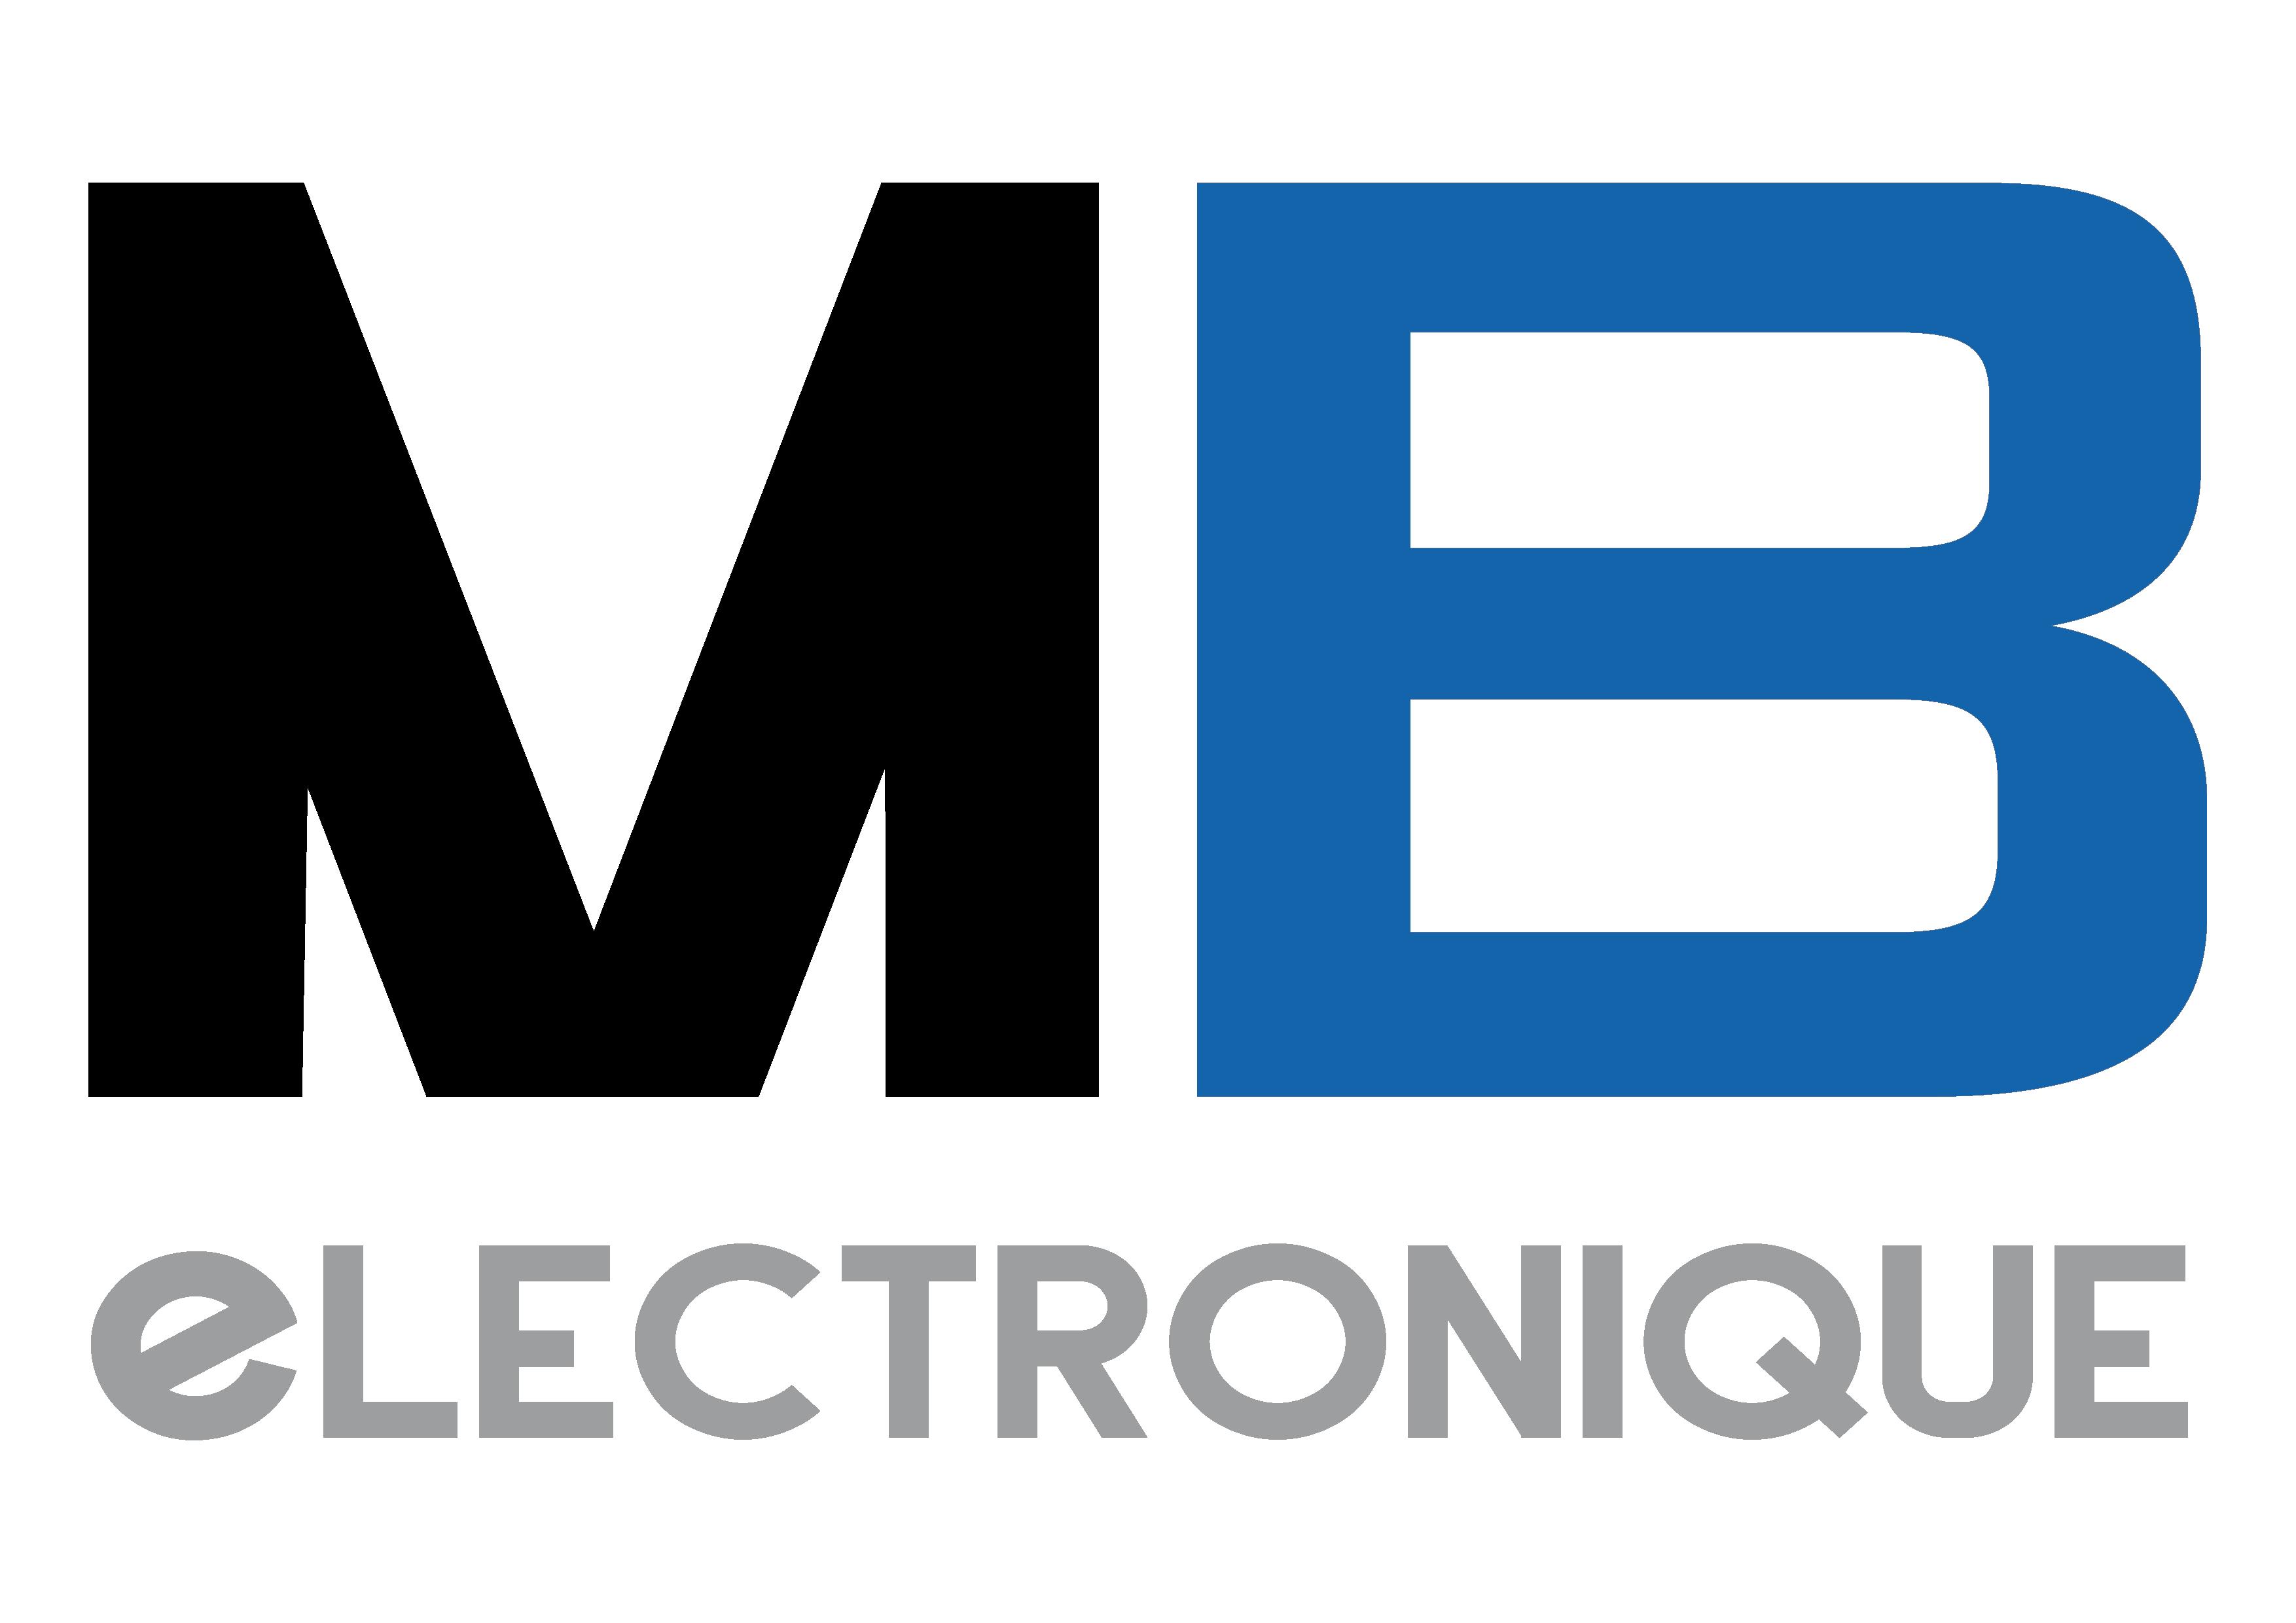 MB Electronique Logo